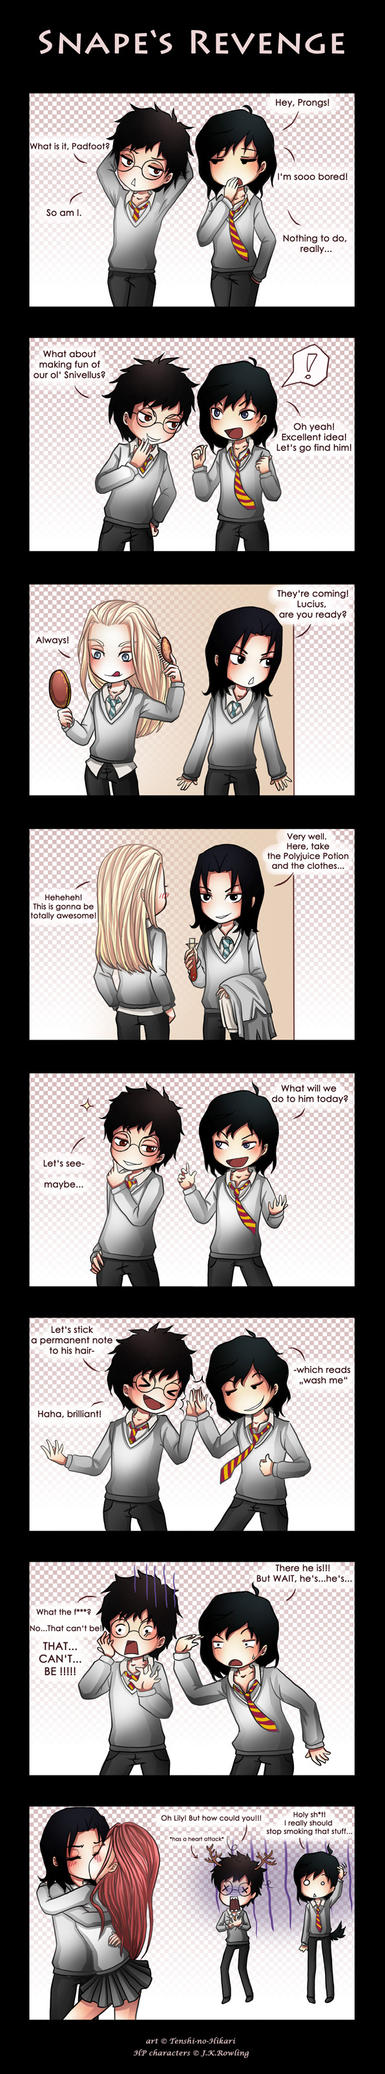 HP - Snape's Revenge by Tenshi-no-Hikari